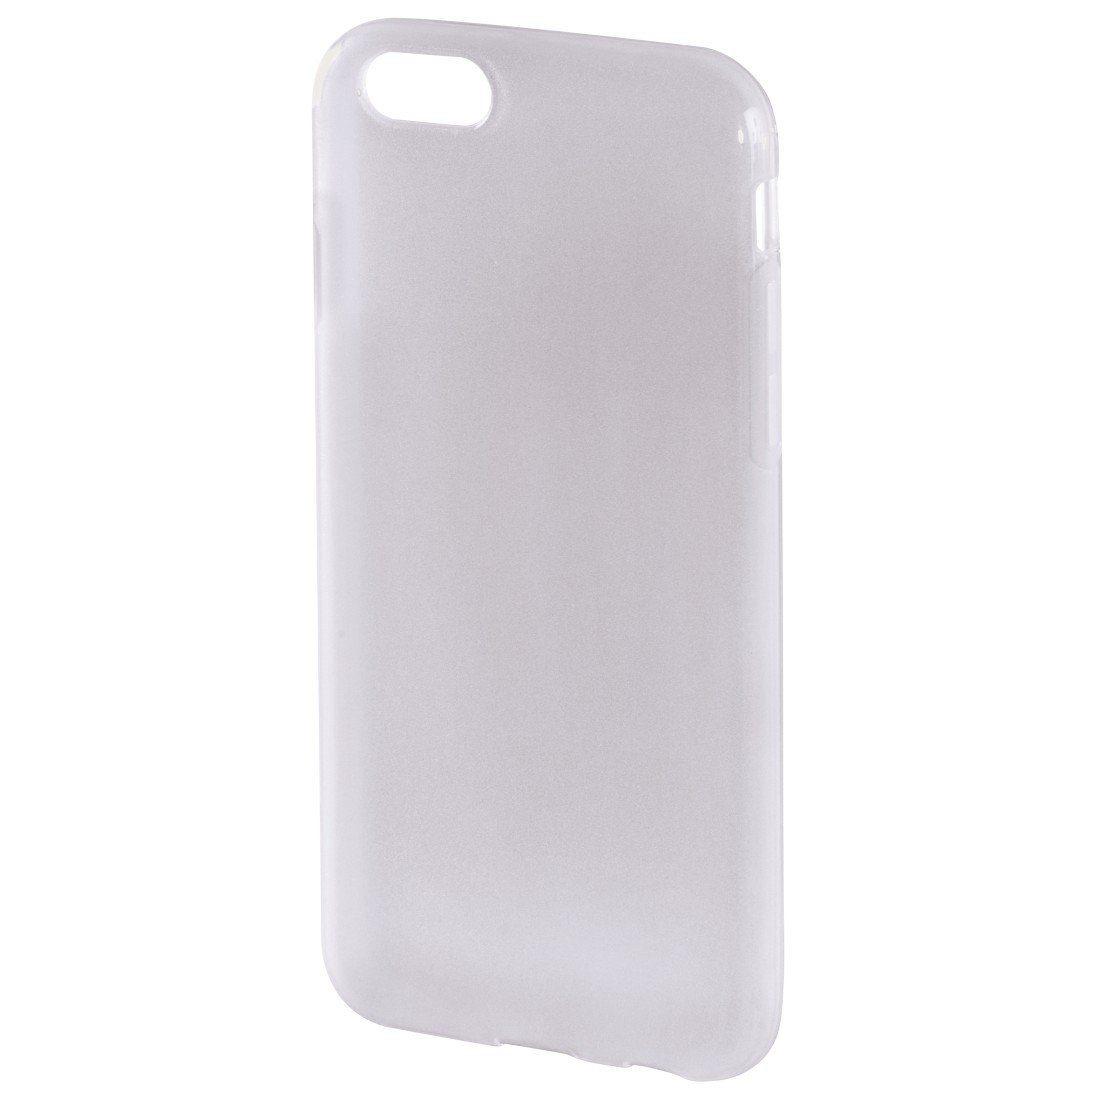 Hama Cover iPhone 6 Plus u. iPhone 6s Plus Schutzhülle Case »Hülle für iPhone, transparent«